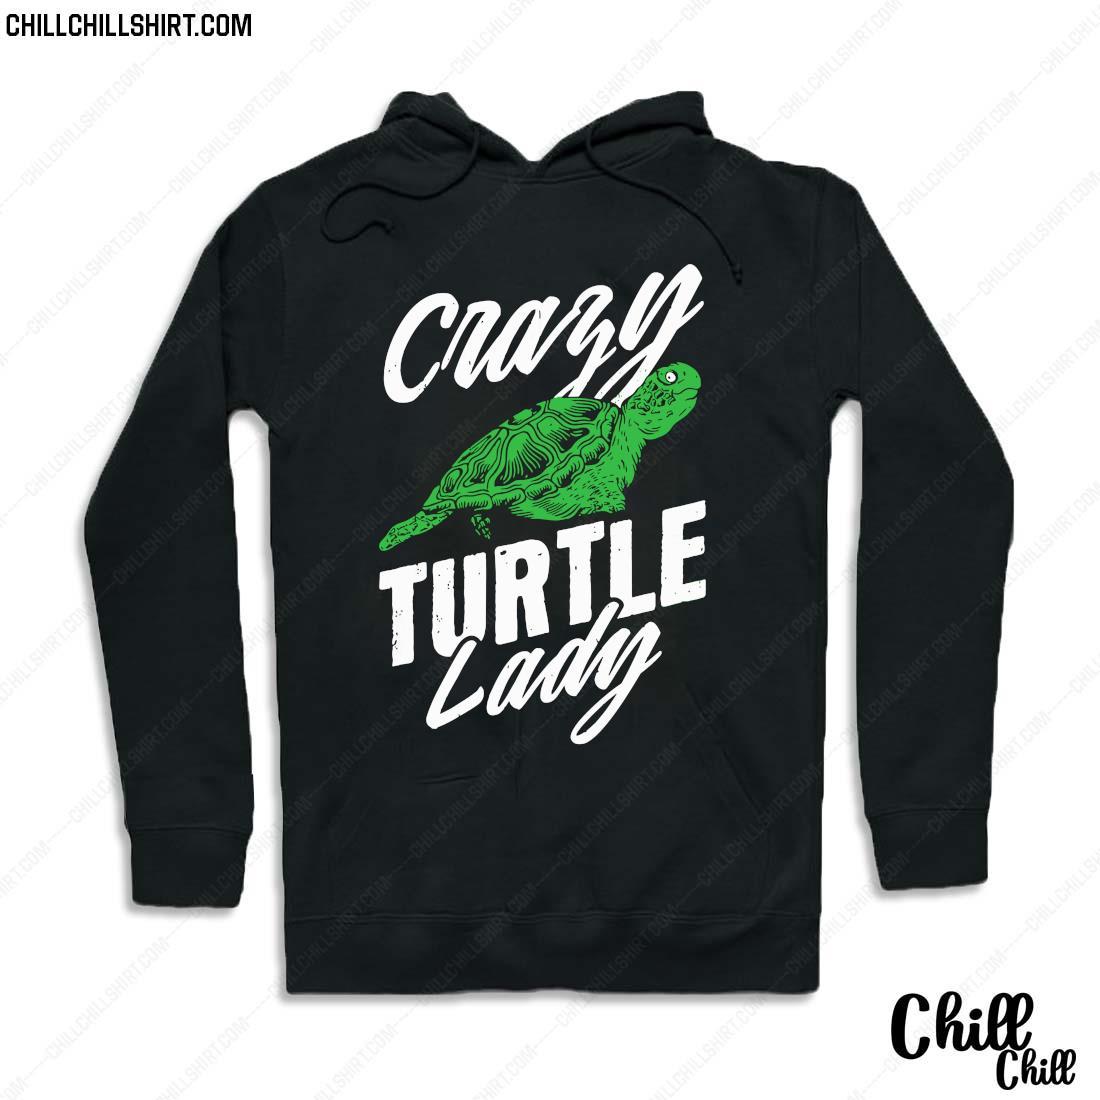 Crazy Turtle Lady Funny Turtles Shirt Hoodie